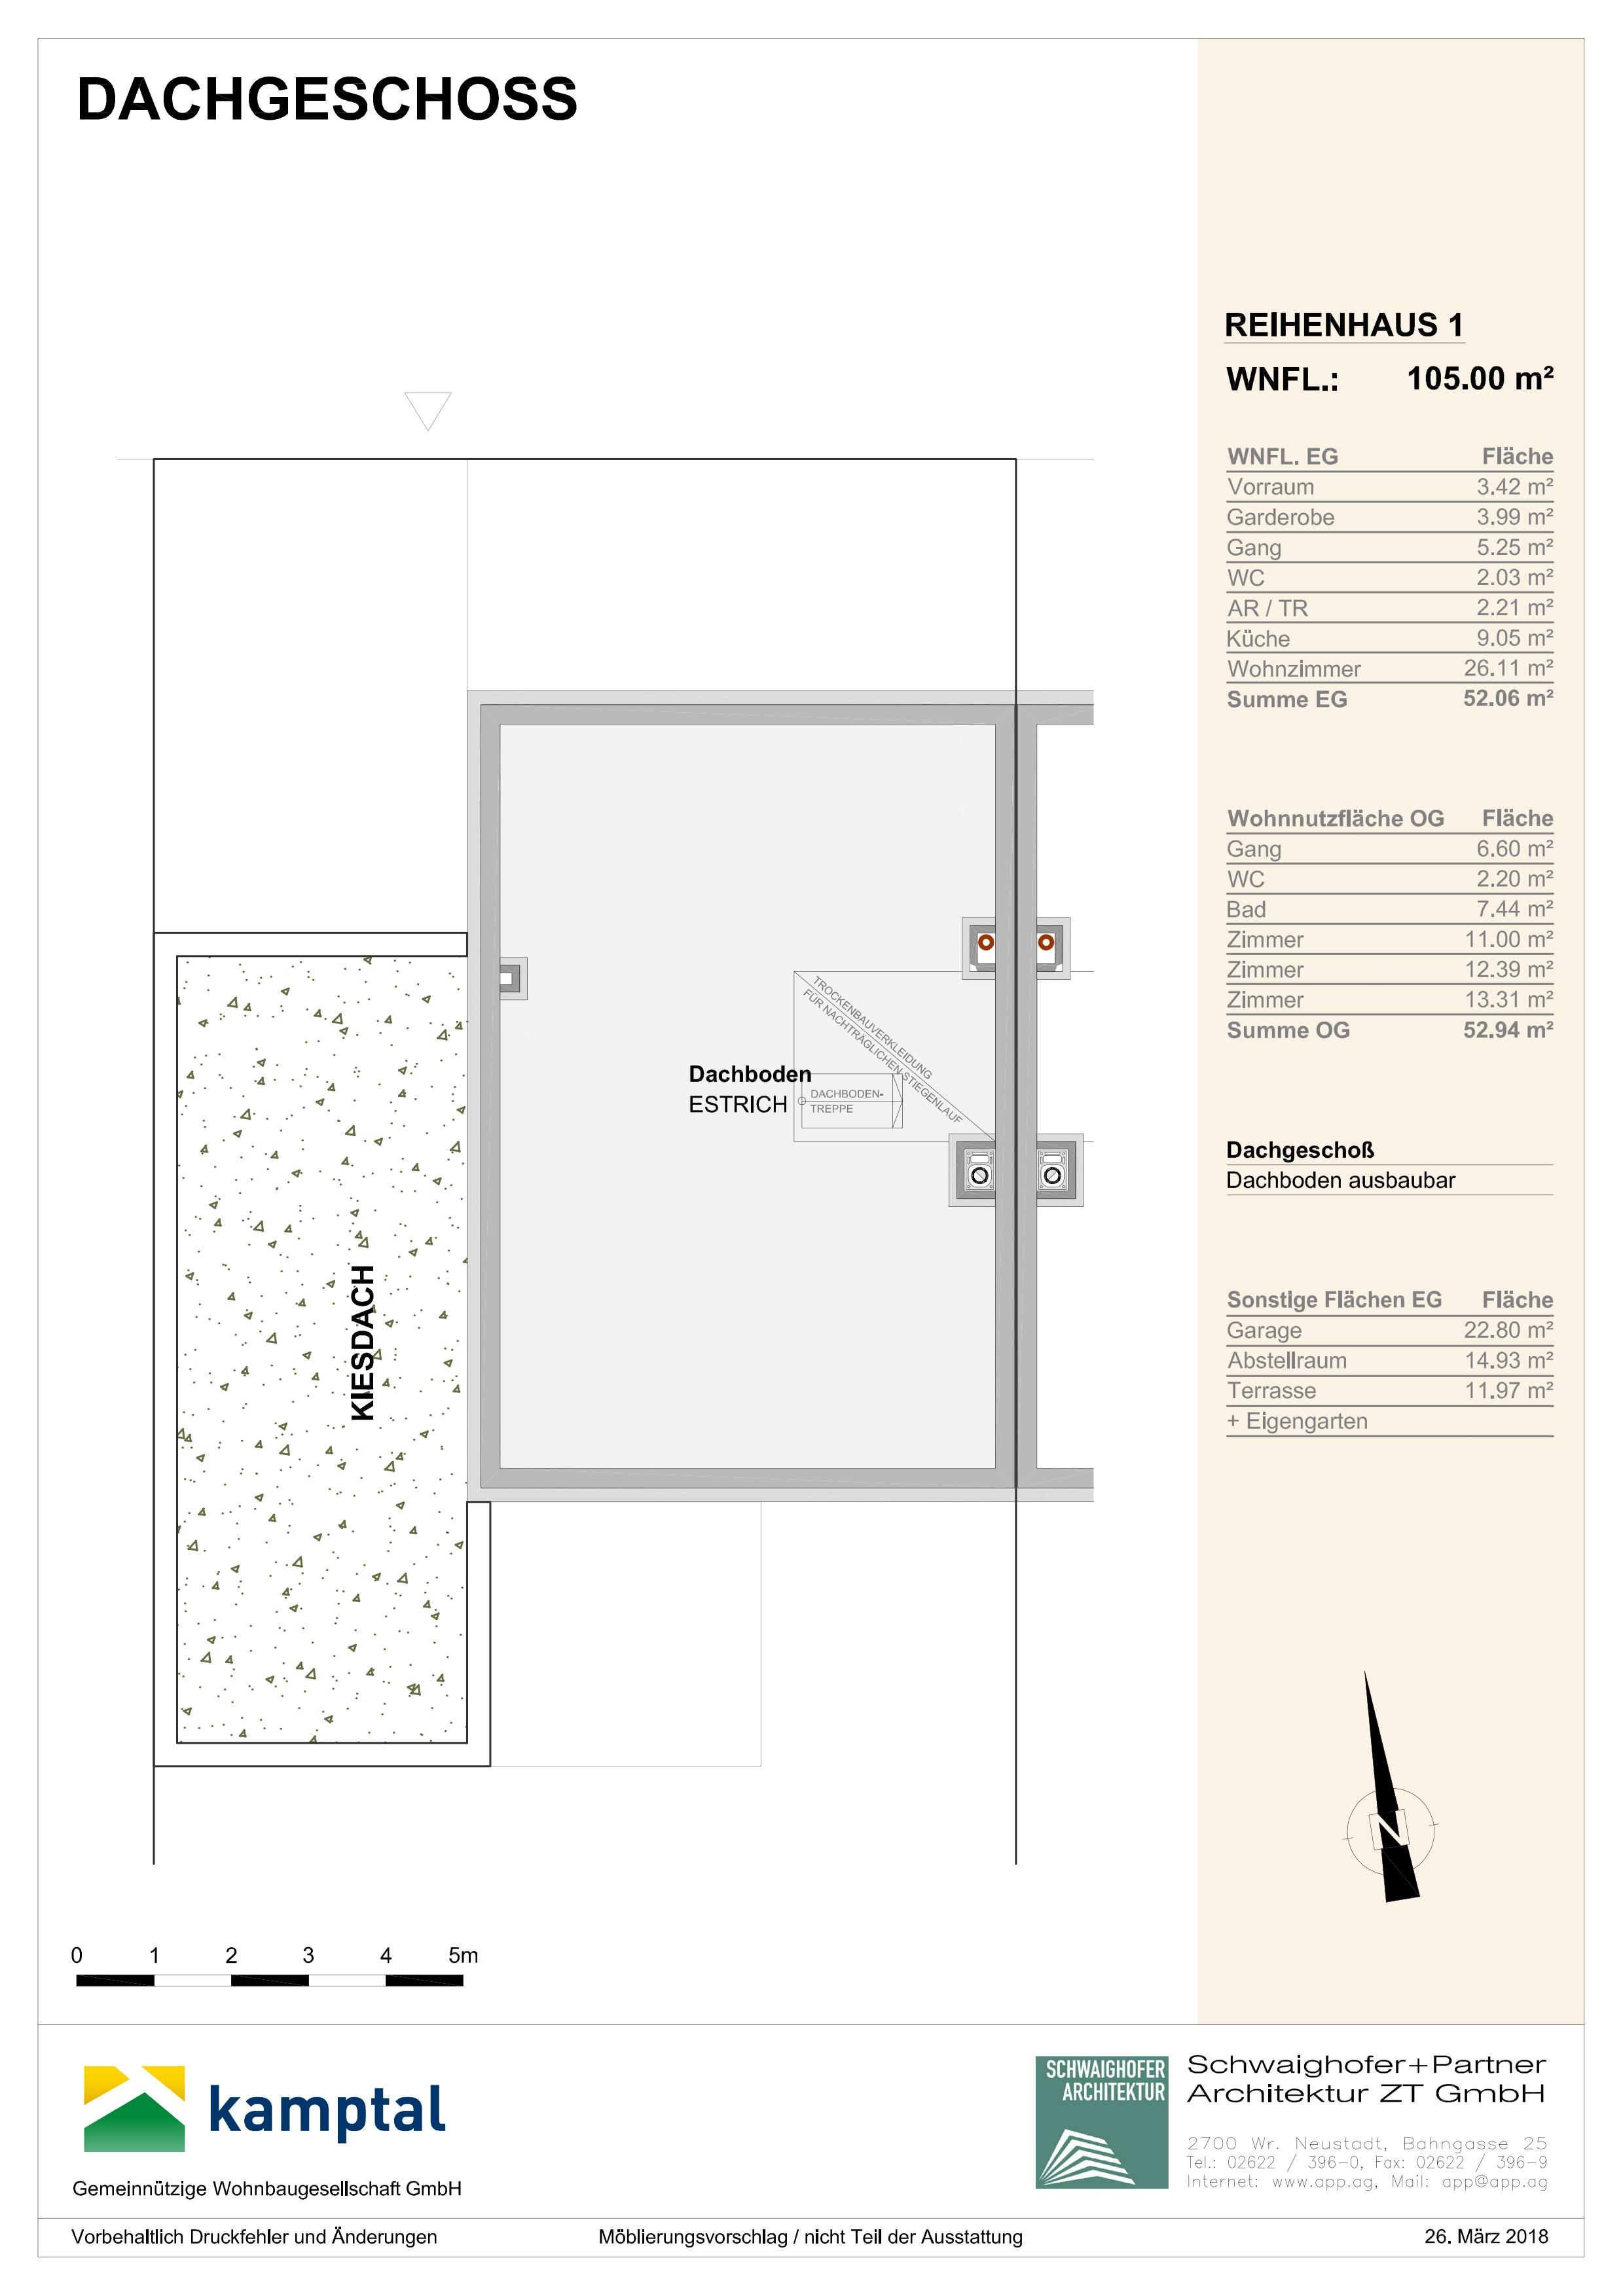 Immobilie von Kamptal in 2136 Laa an der Thaya, Mistelbach, Laa/Thaya XVIII - Top 7 #2